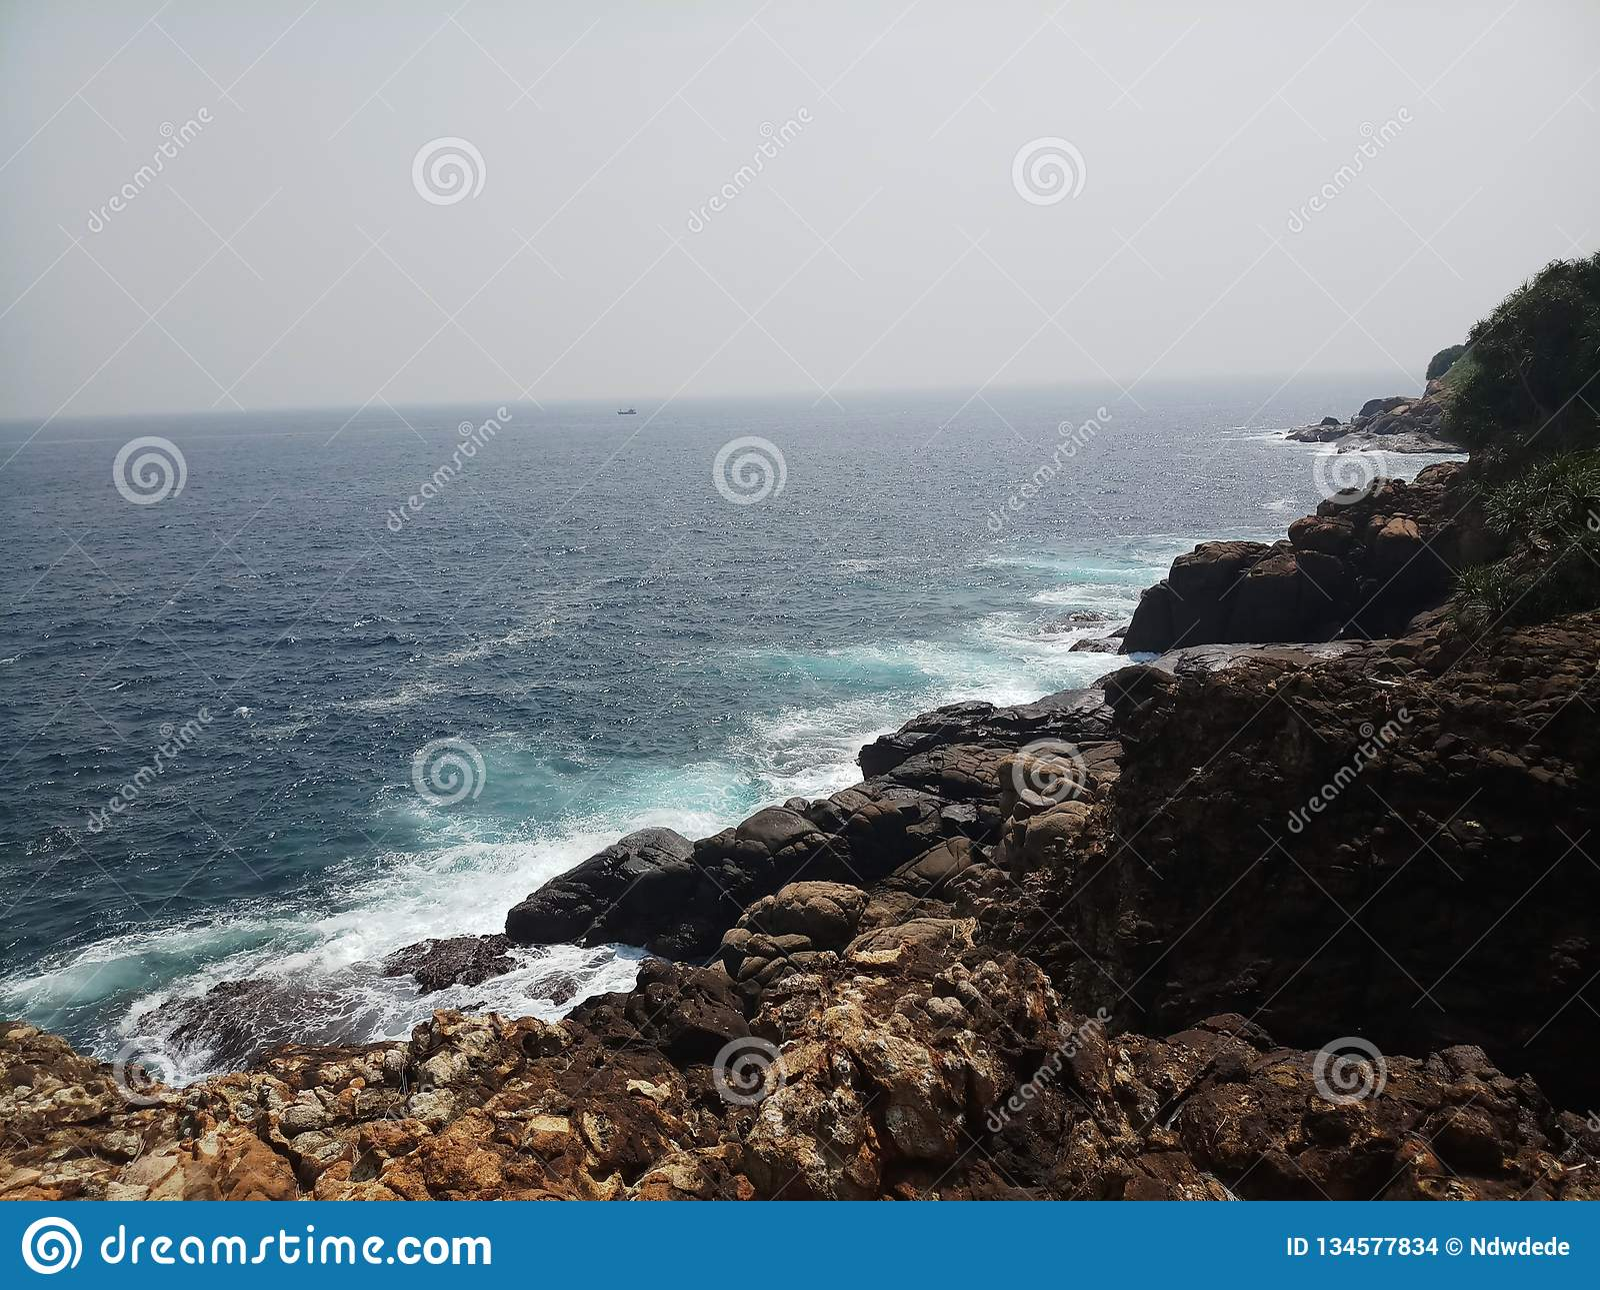 Blue sea with rocks